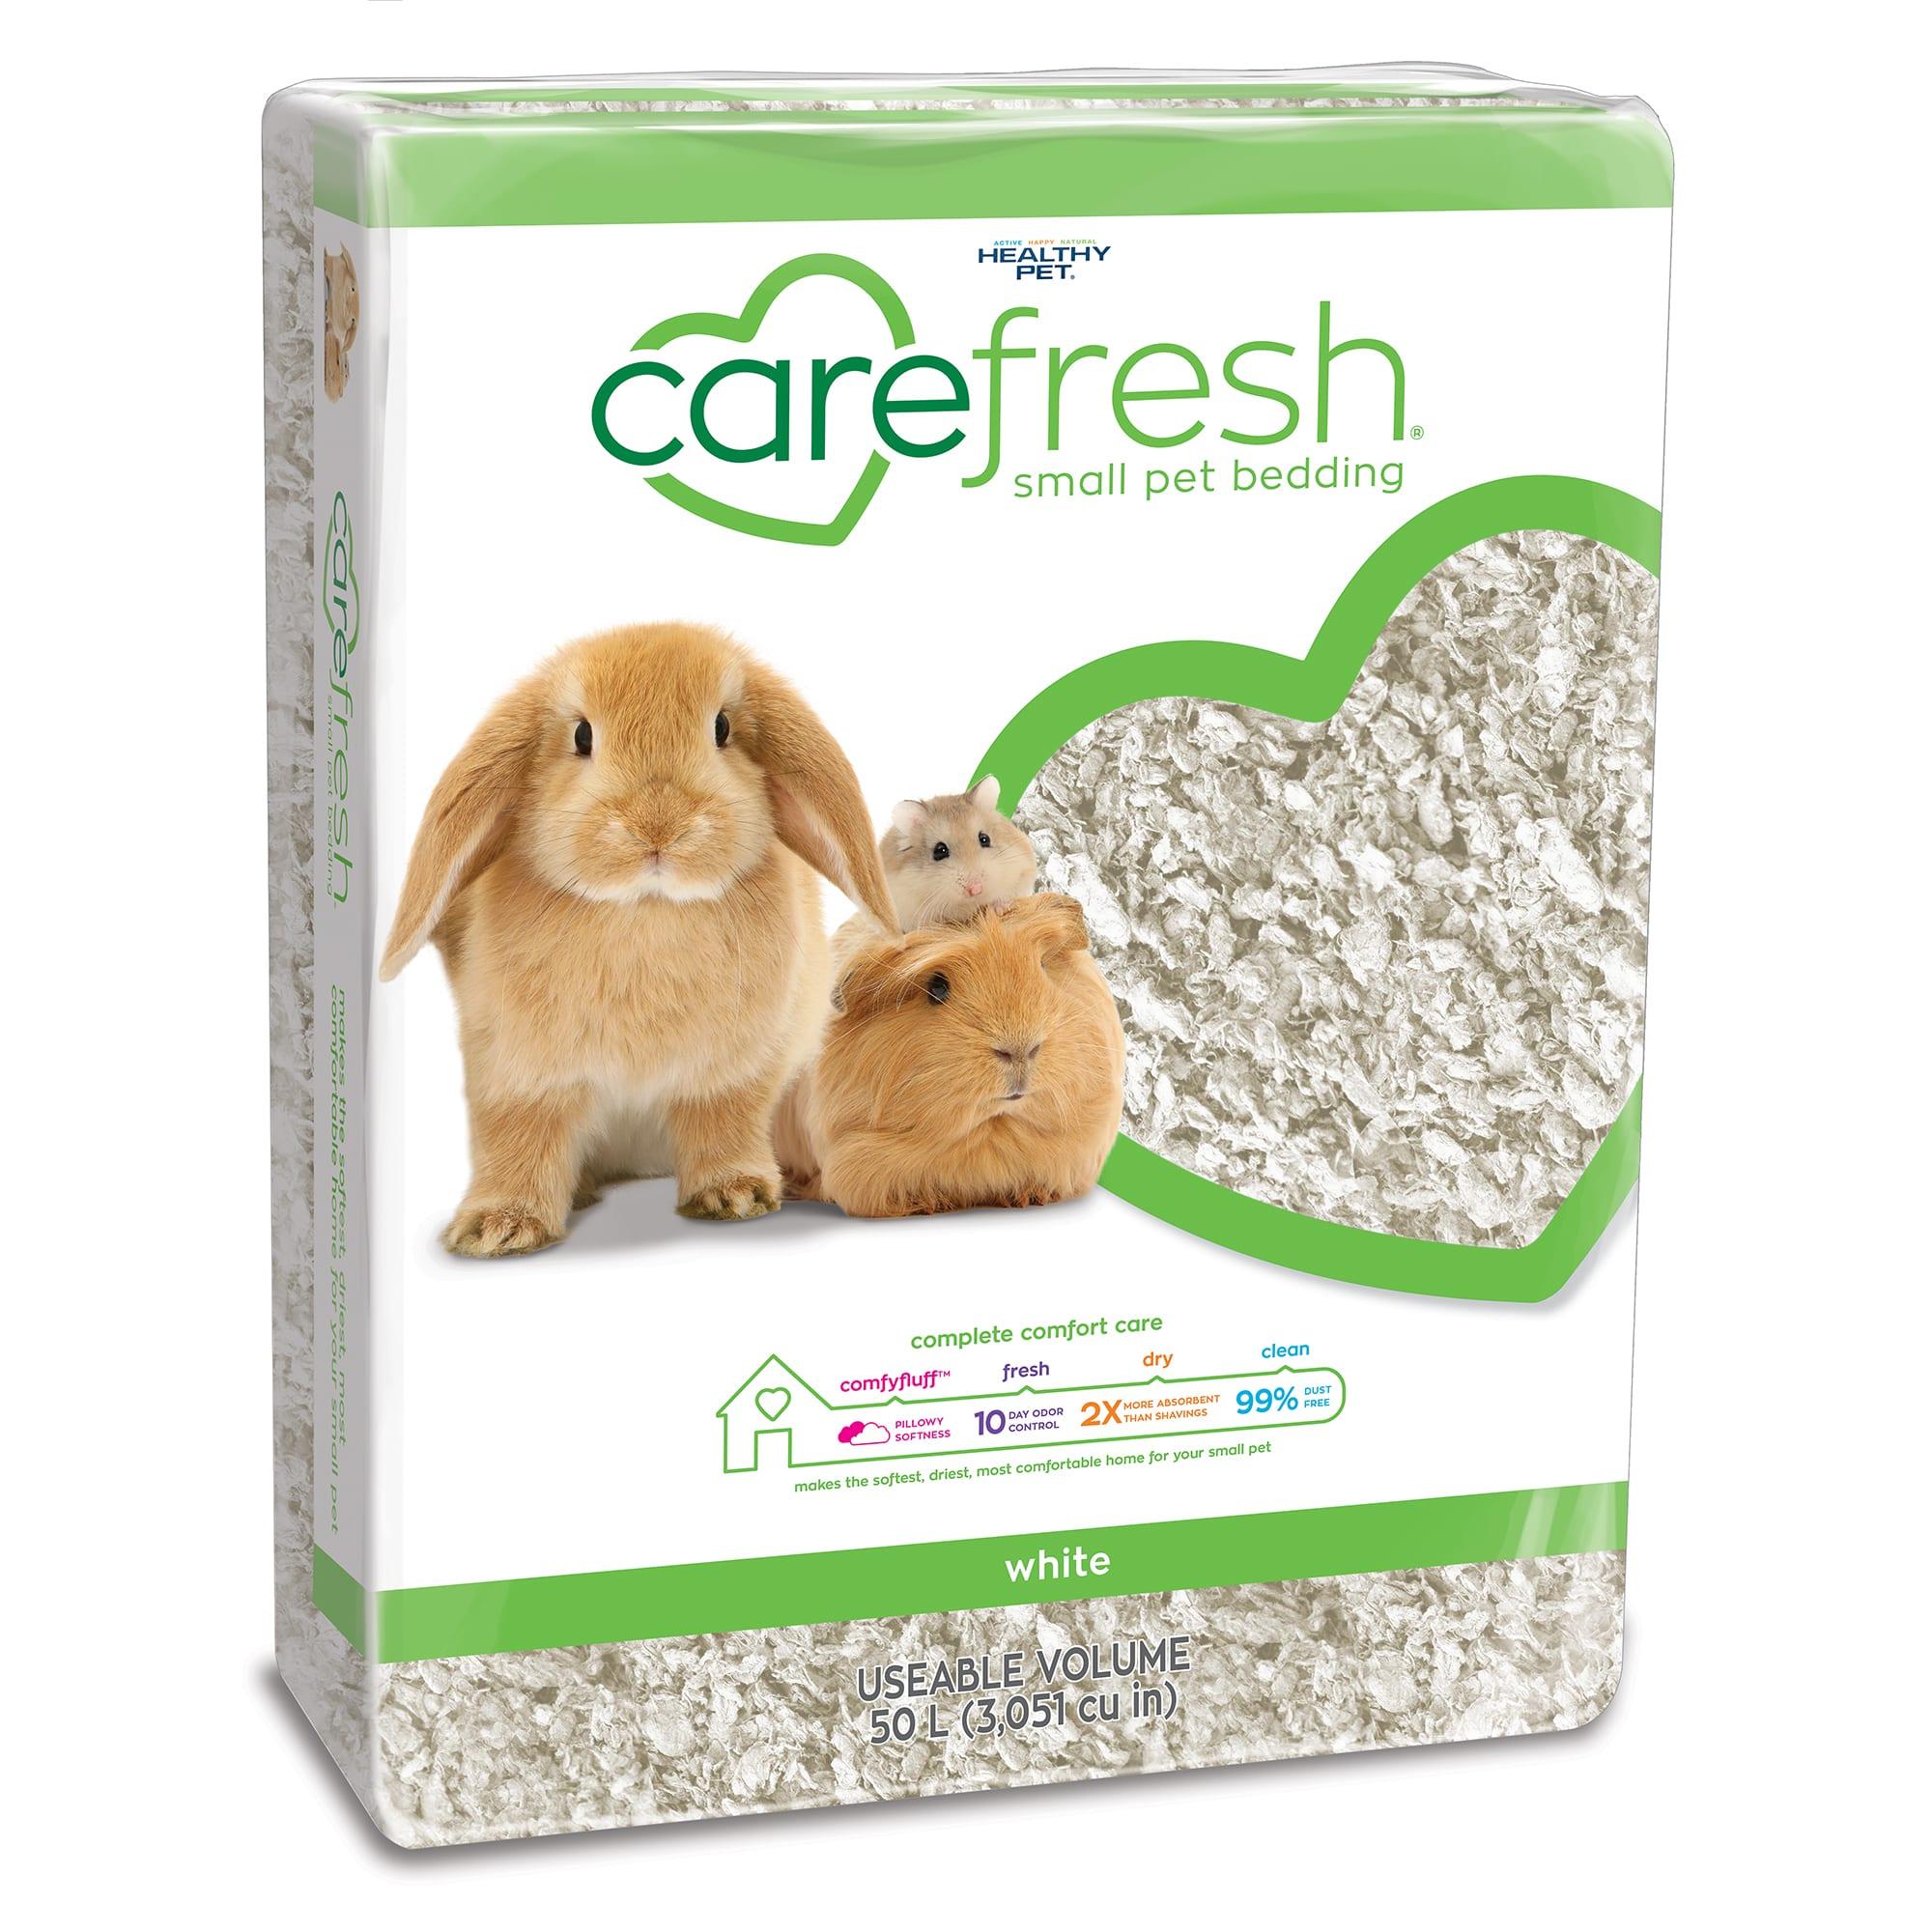 Carefresh White Small Pet Bedding 50 Liter Petco